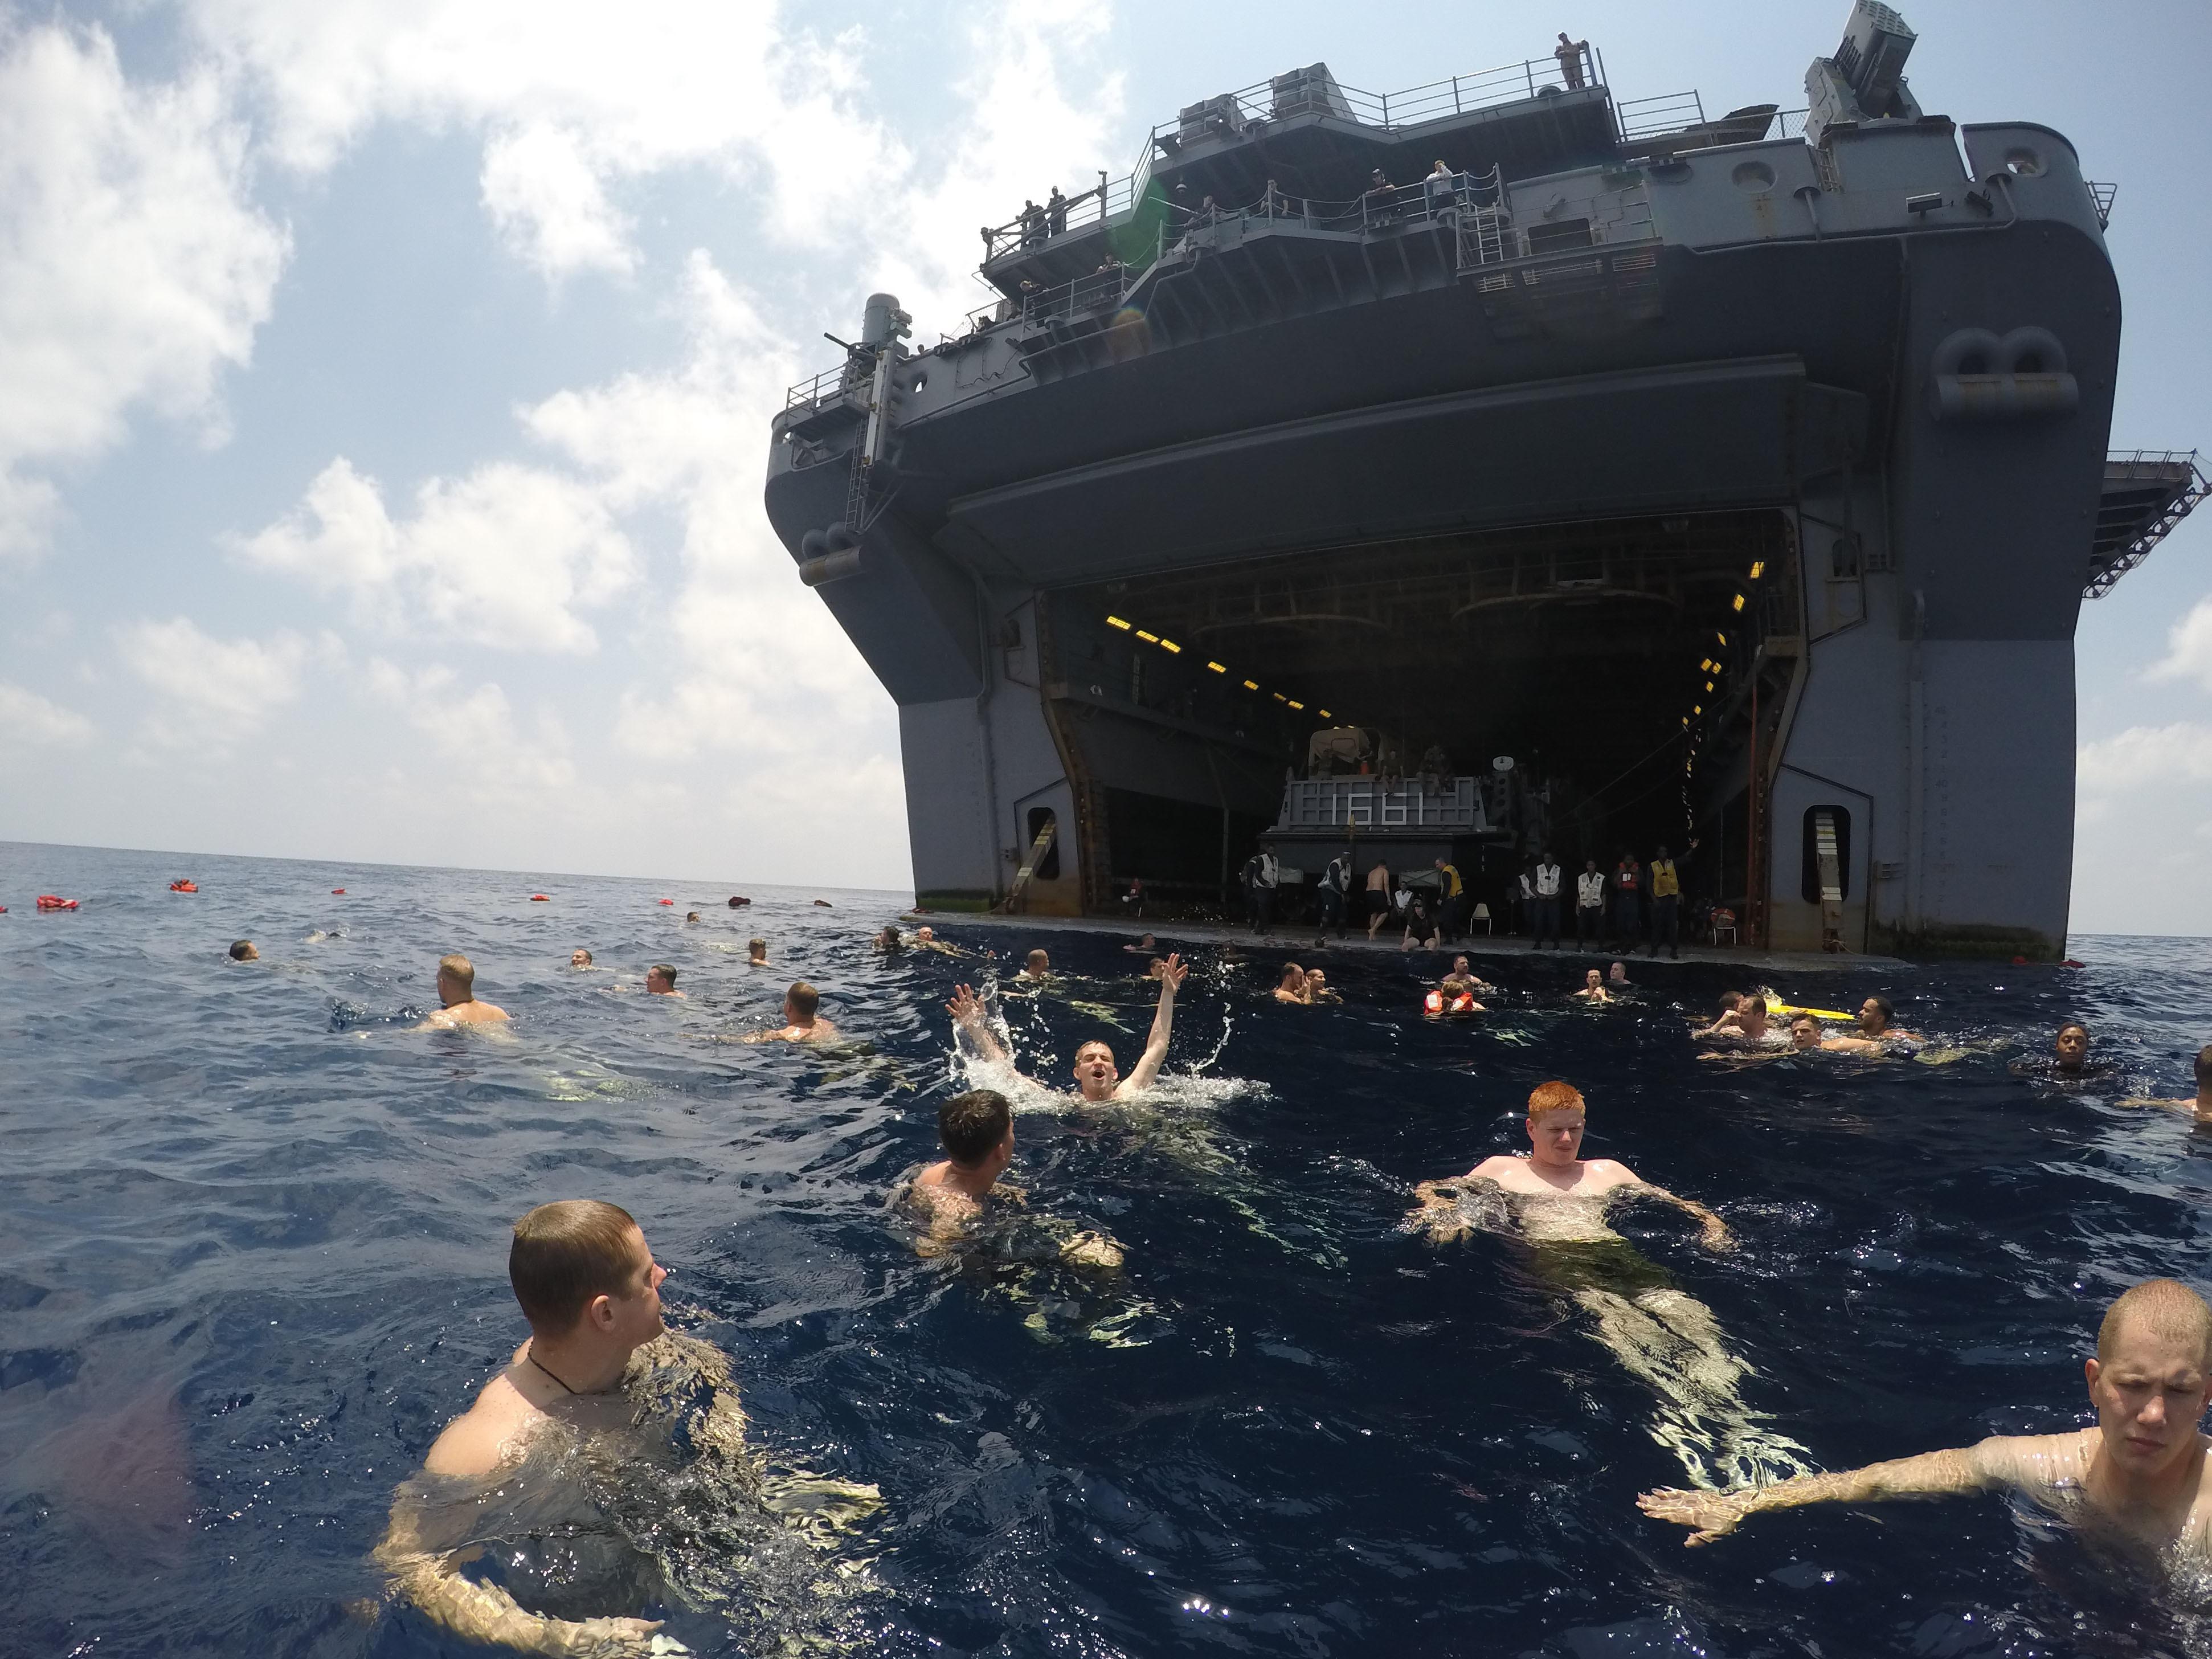 File:USS Iwo Jima swim call 150418-N-JN023-549.jpg